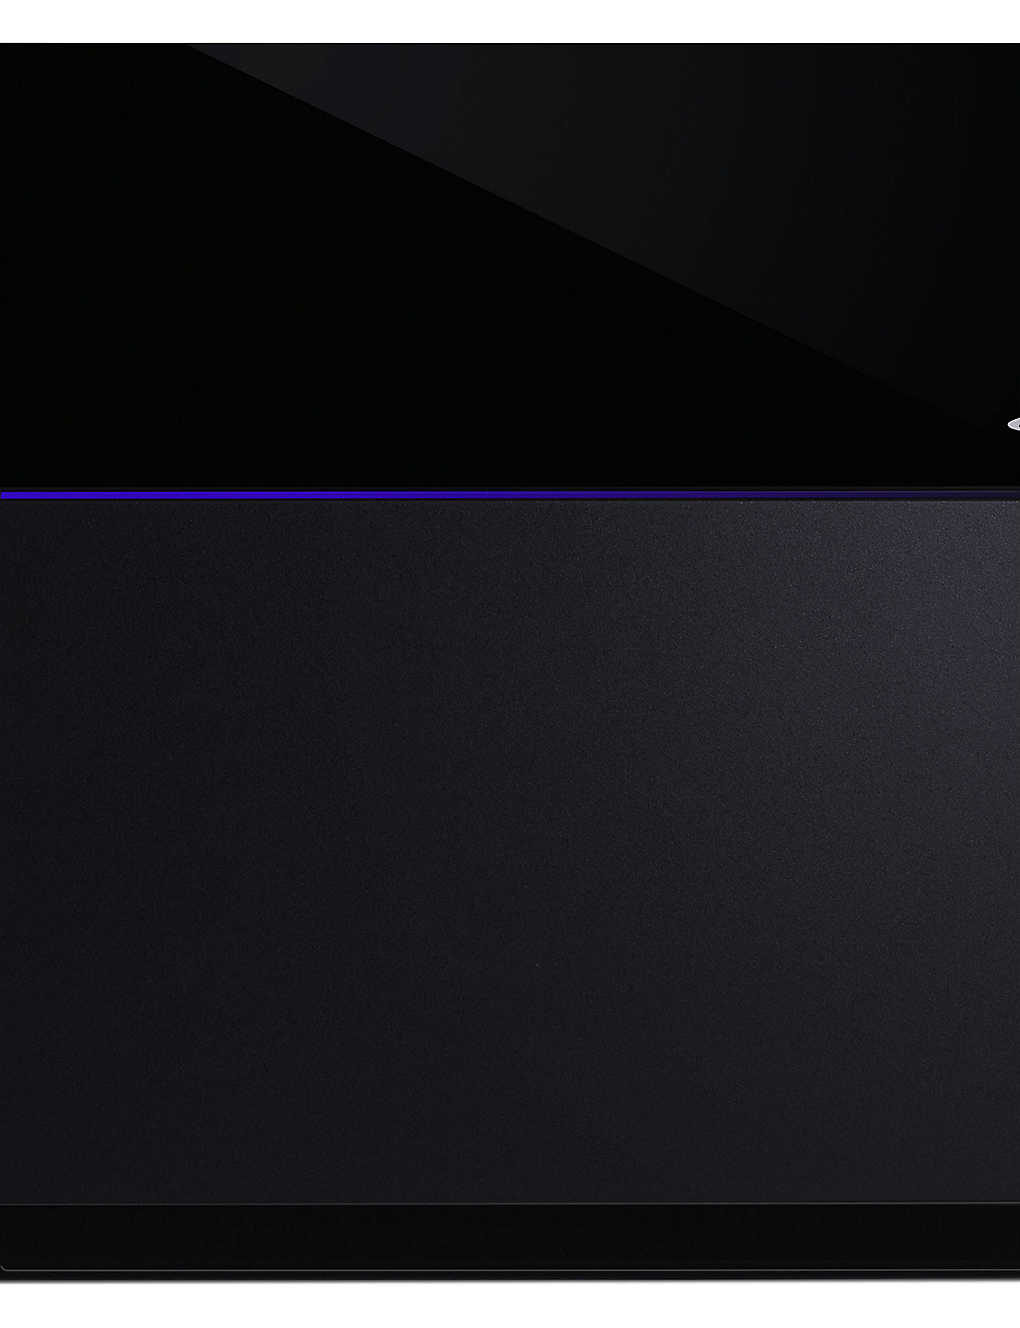 f4b67629e64 SONY - PlayStation 4 console | Selfridges.com